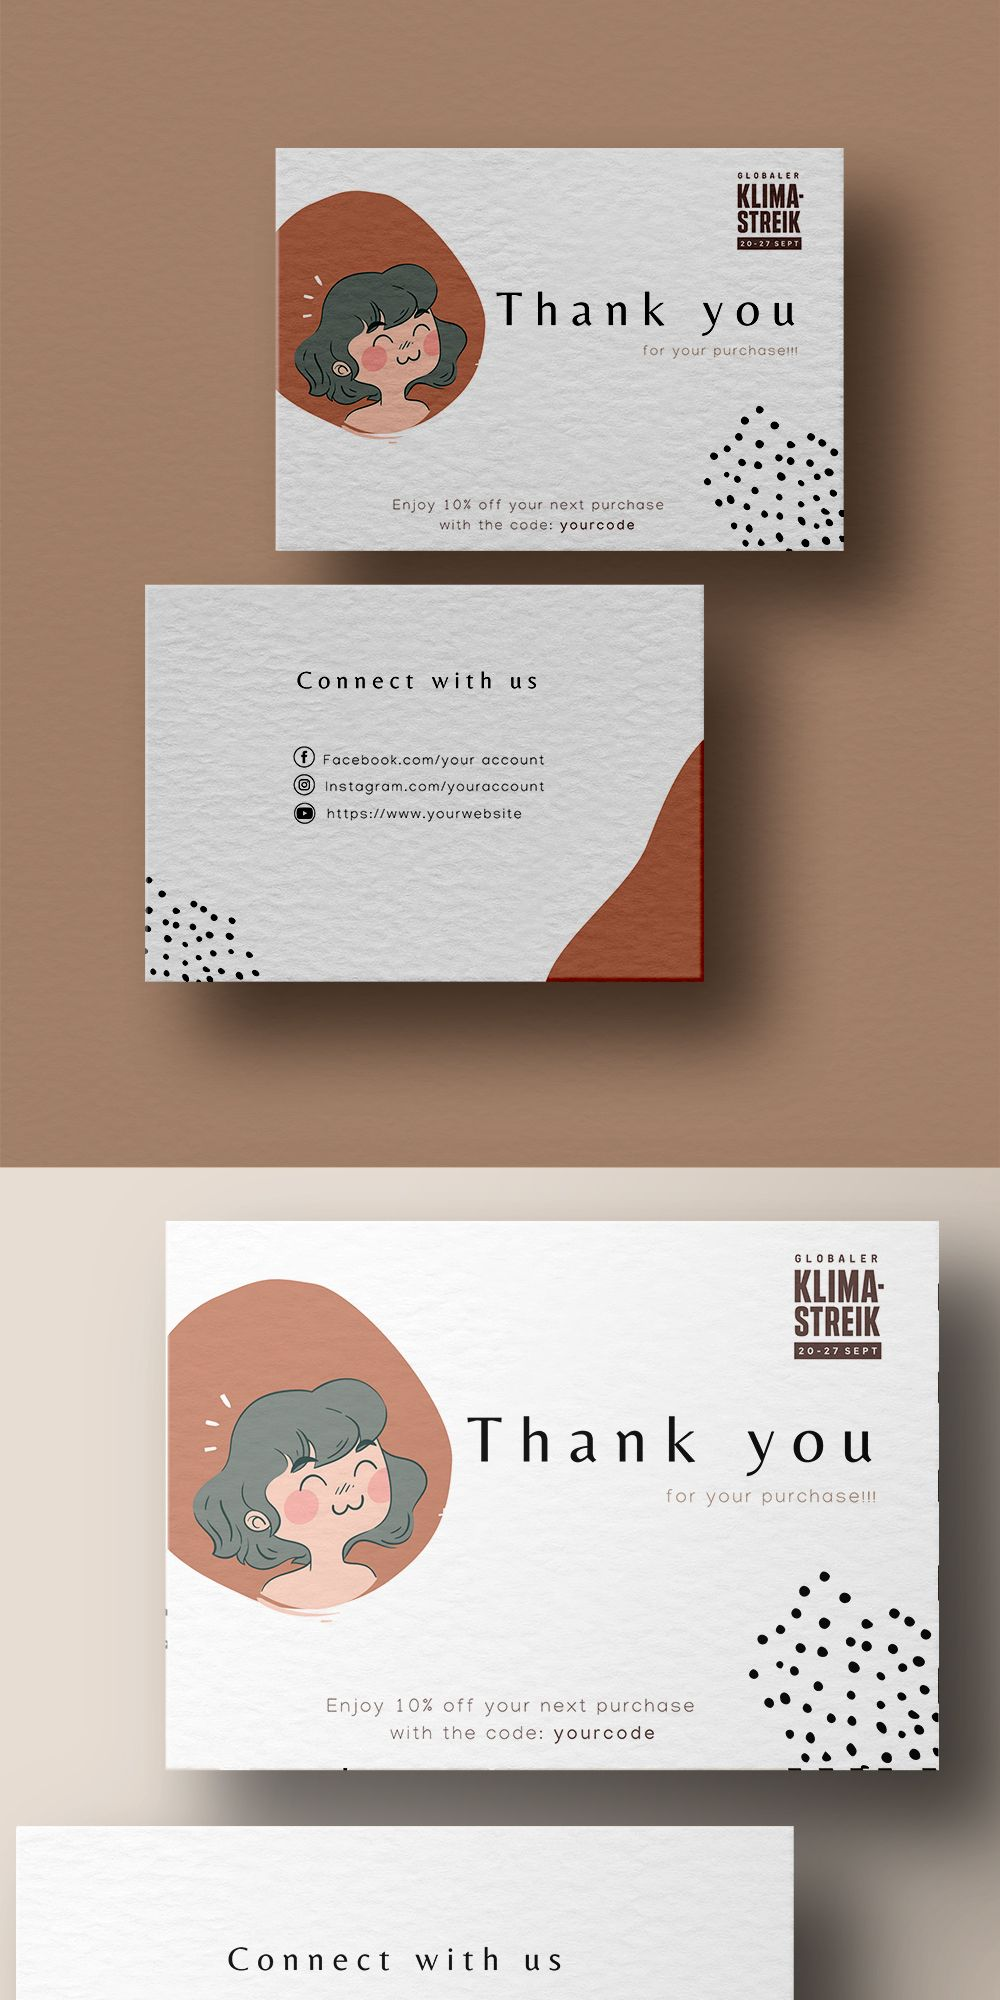 15 Stylish Social Media Business Cards Designs Social Media Business Cards Media Business Cards Business Card Design